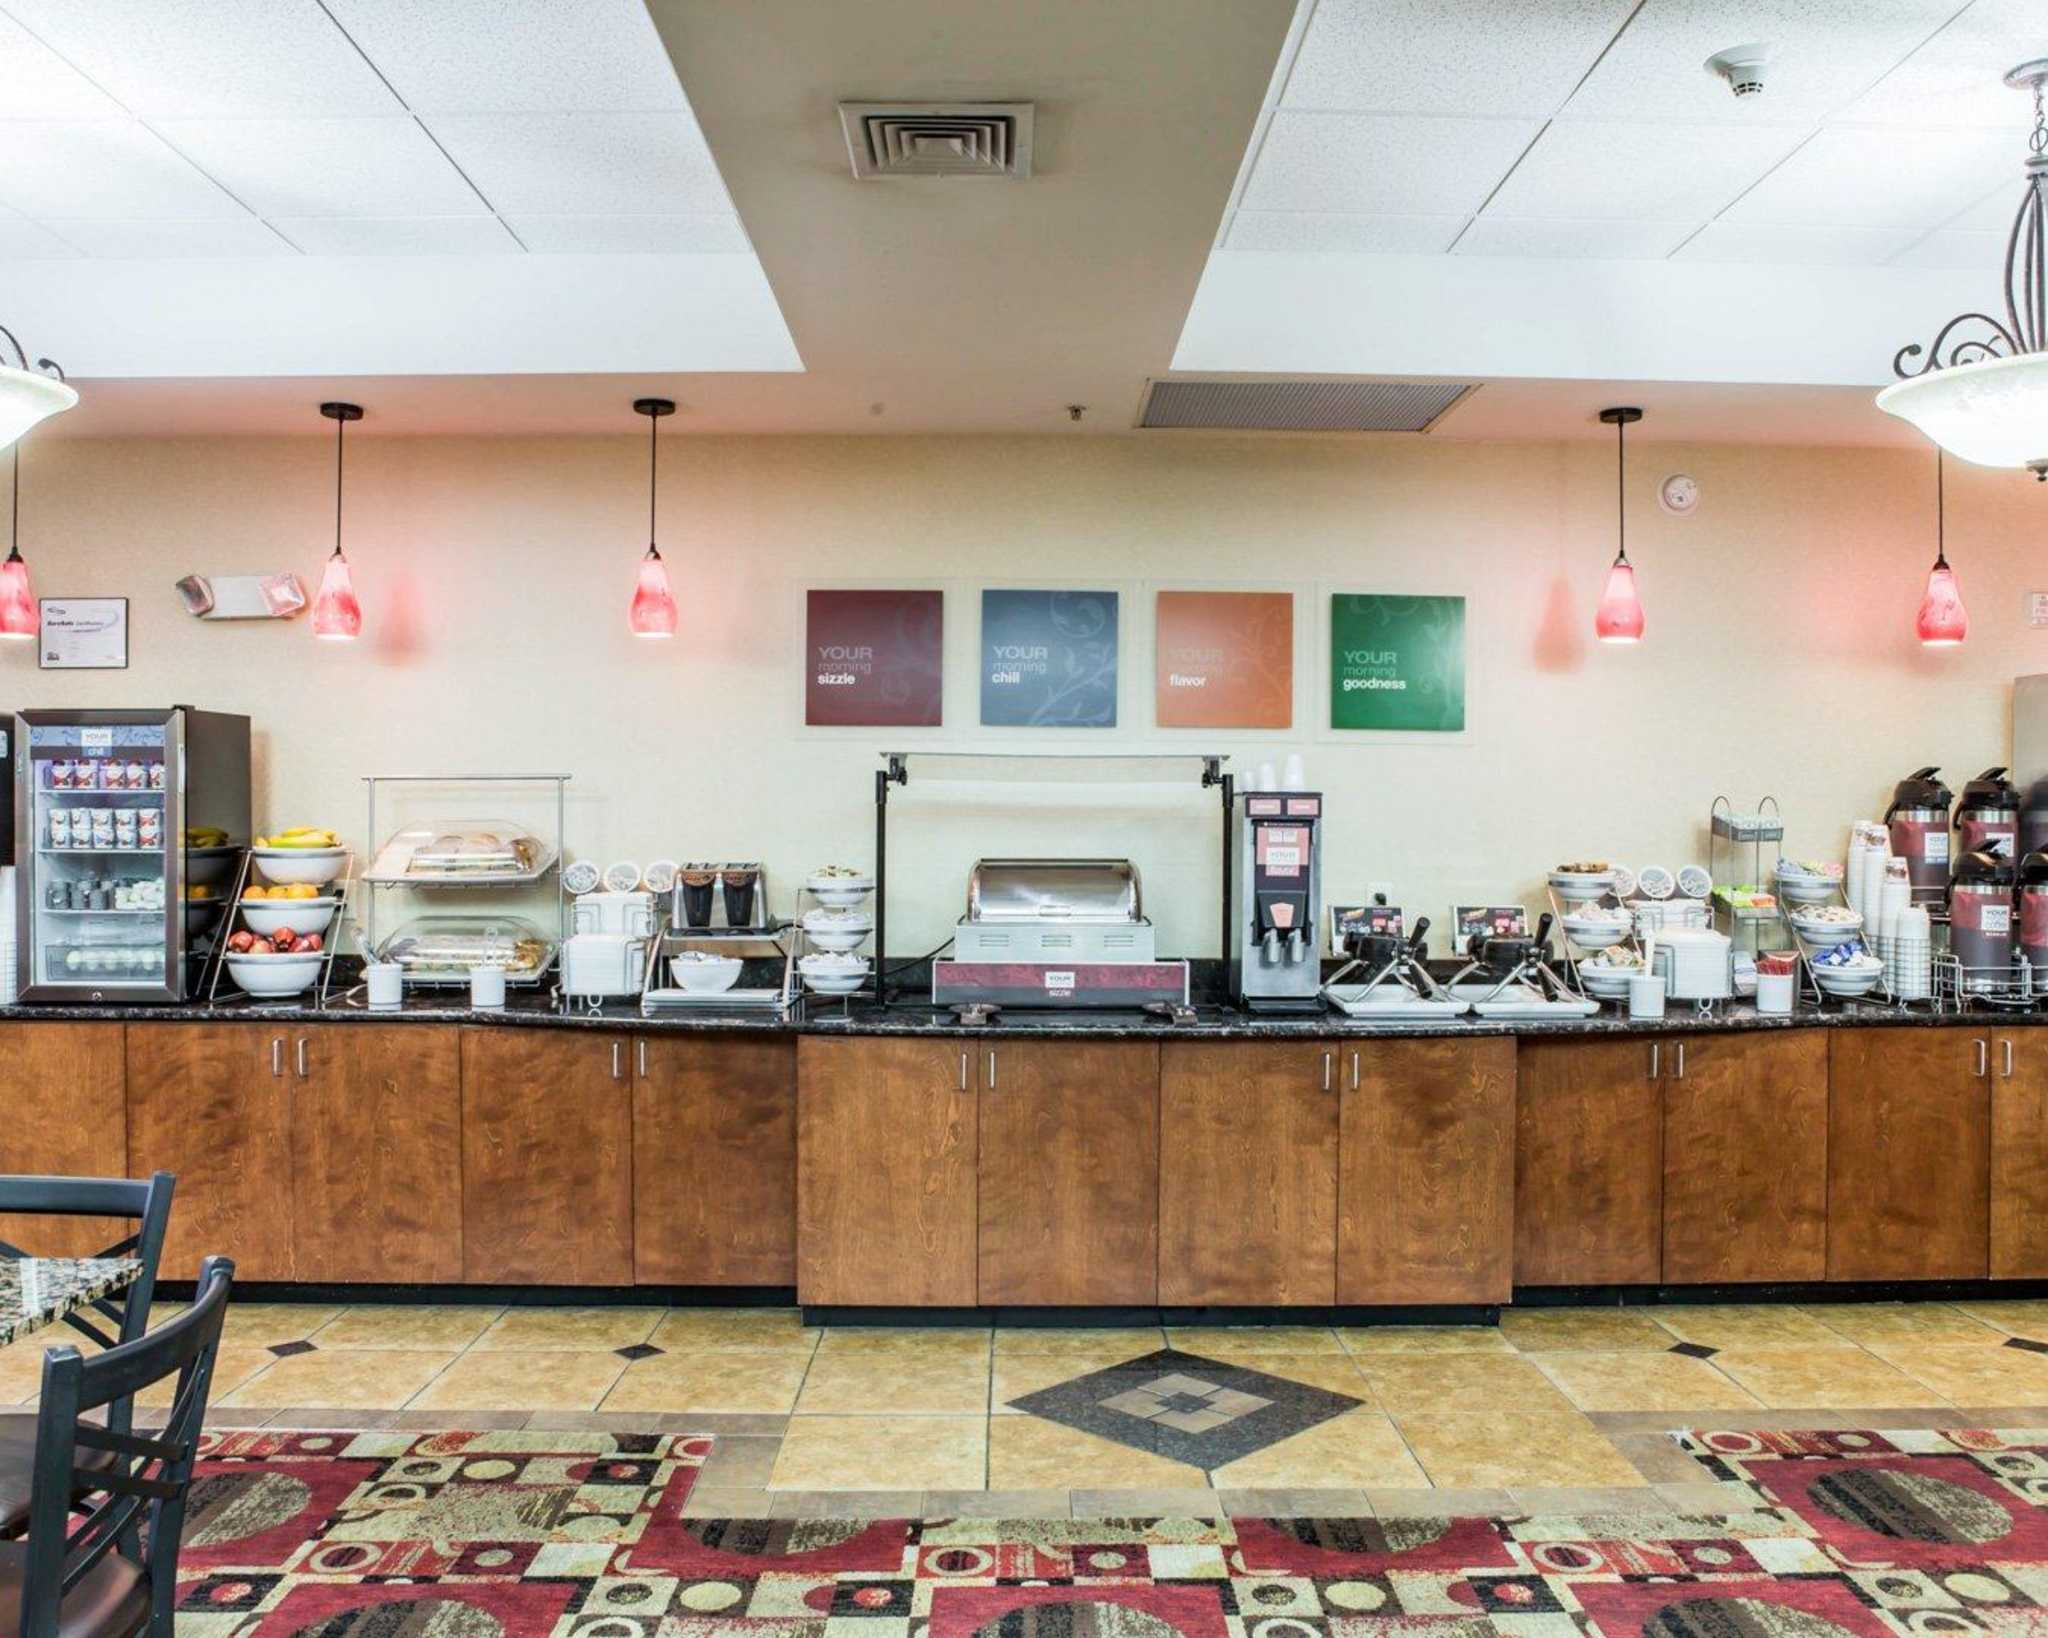 Comfort Suites Four Seasons In Greensboro Nc 27407